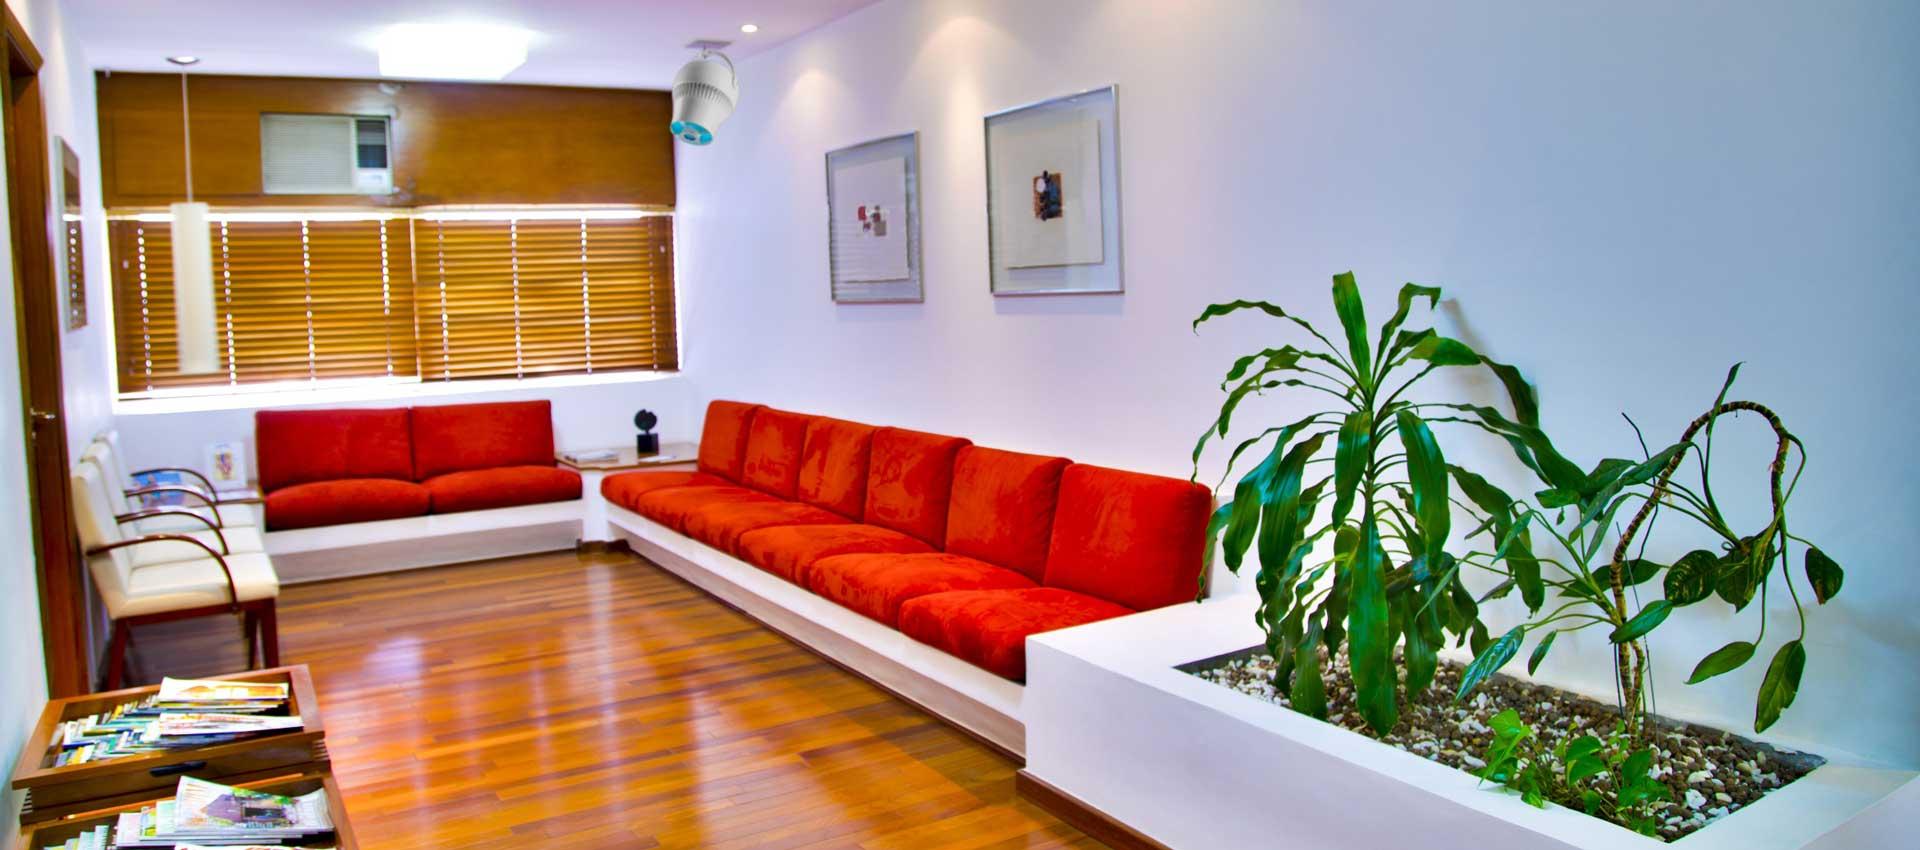 Airius PureAir PHI Air Purification System Installed In a Dentist Waiting Room